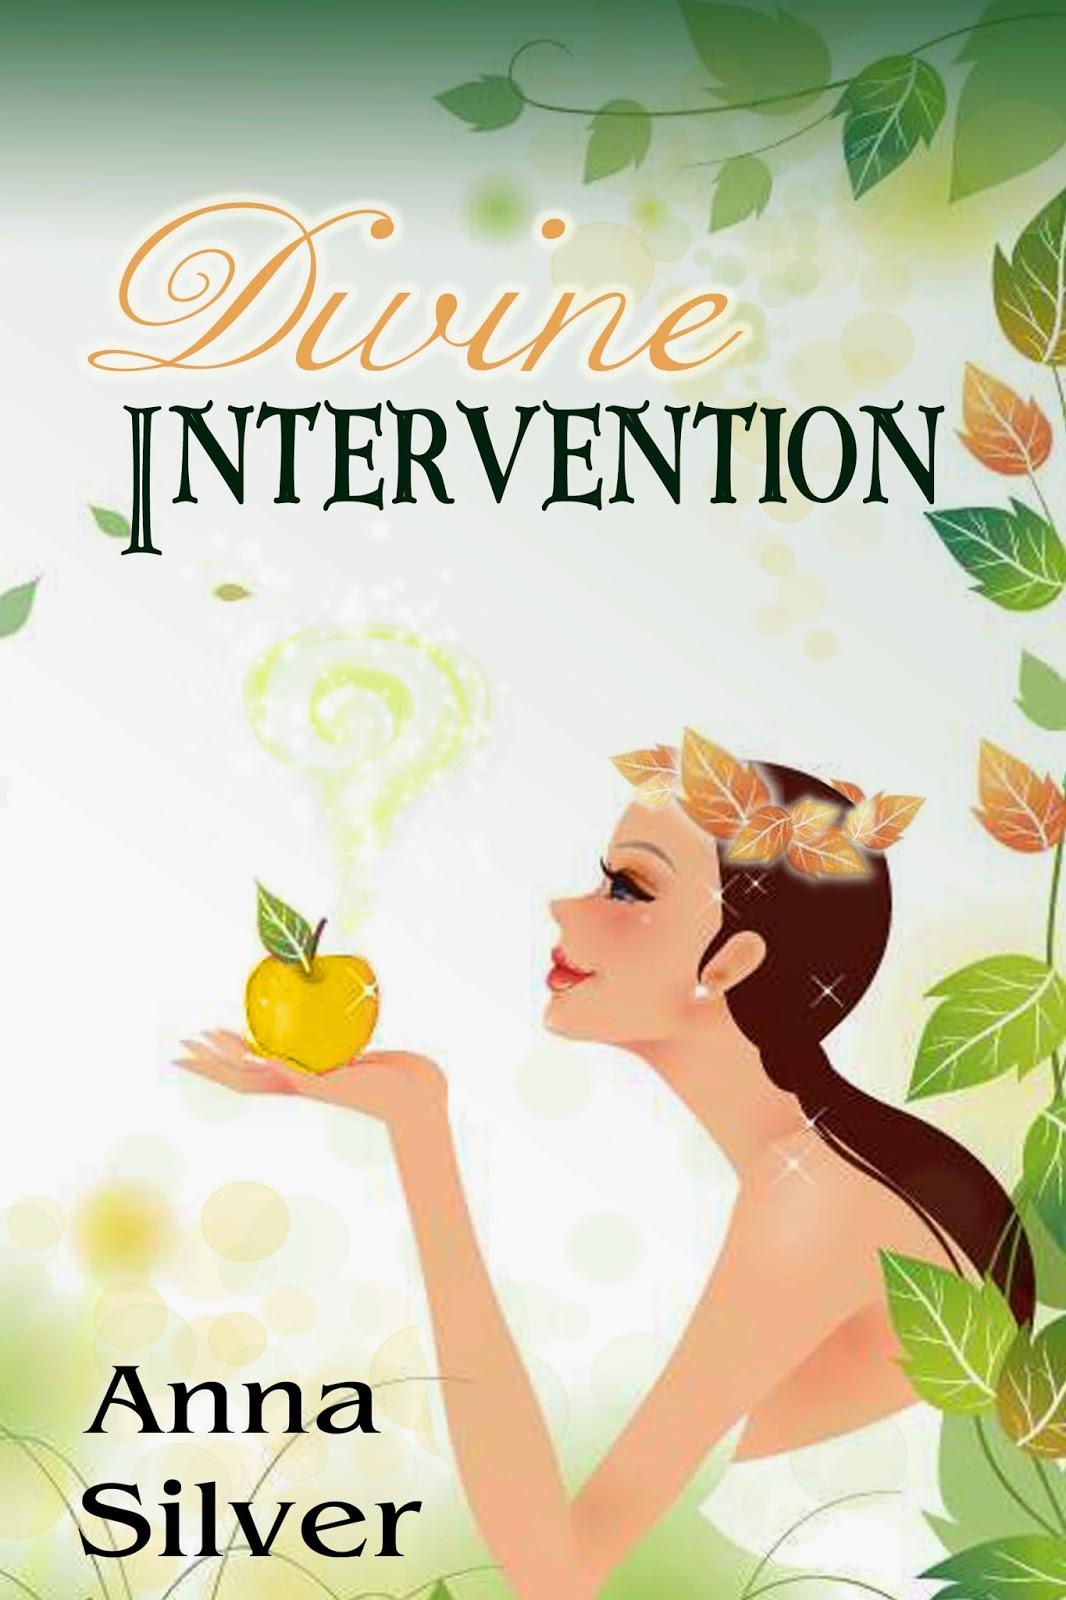 http://www.wattpad.com/myworks/22678391-divine-intervention